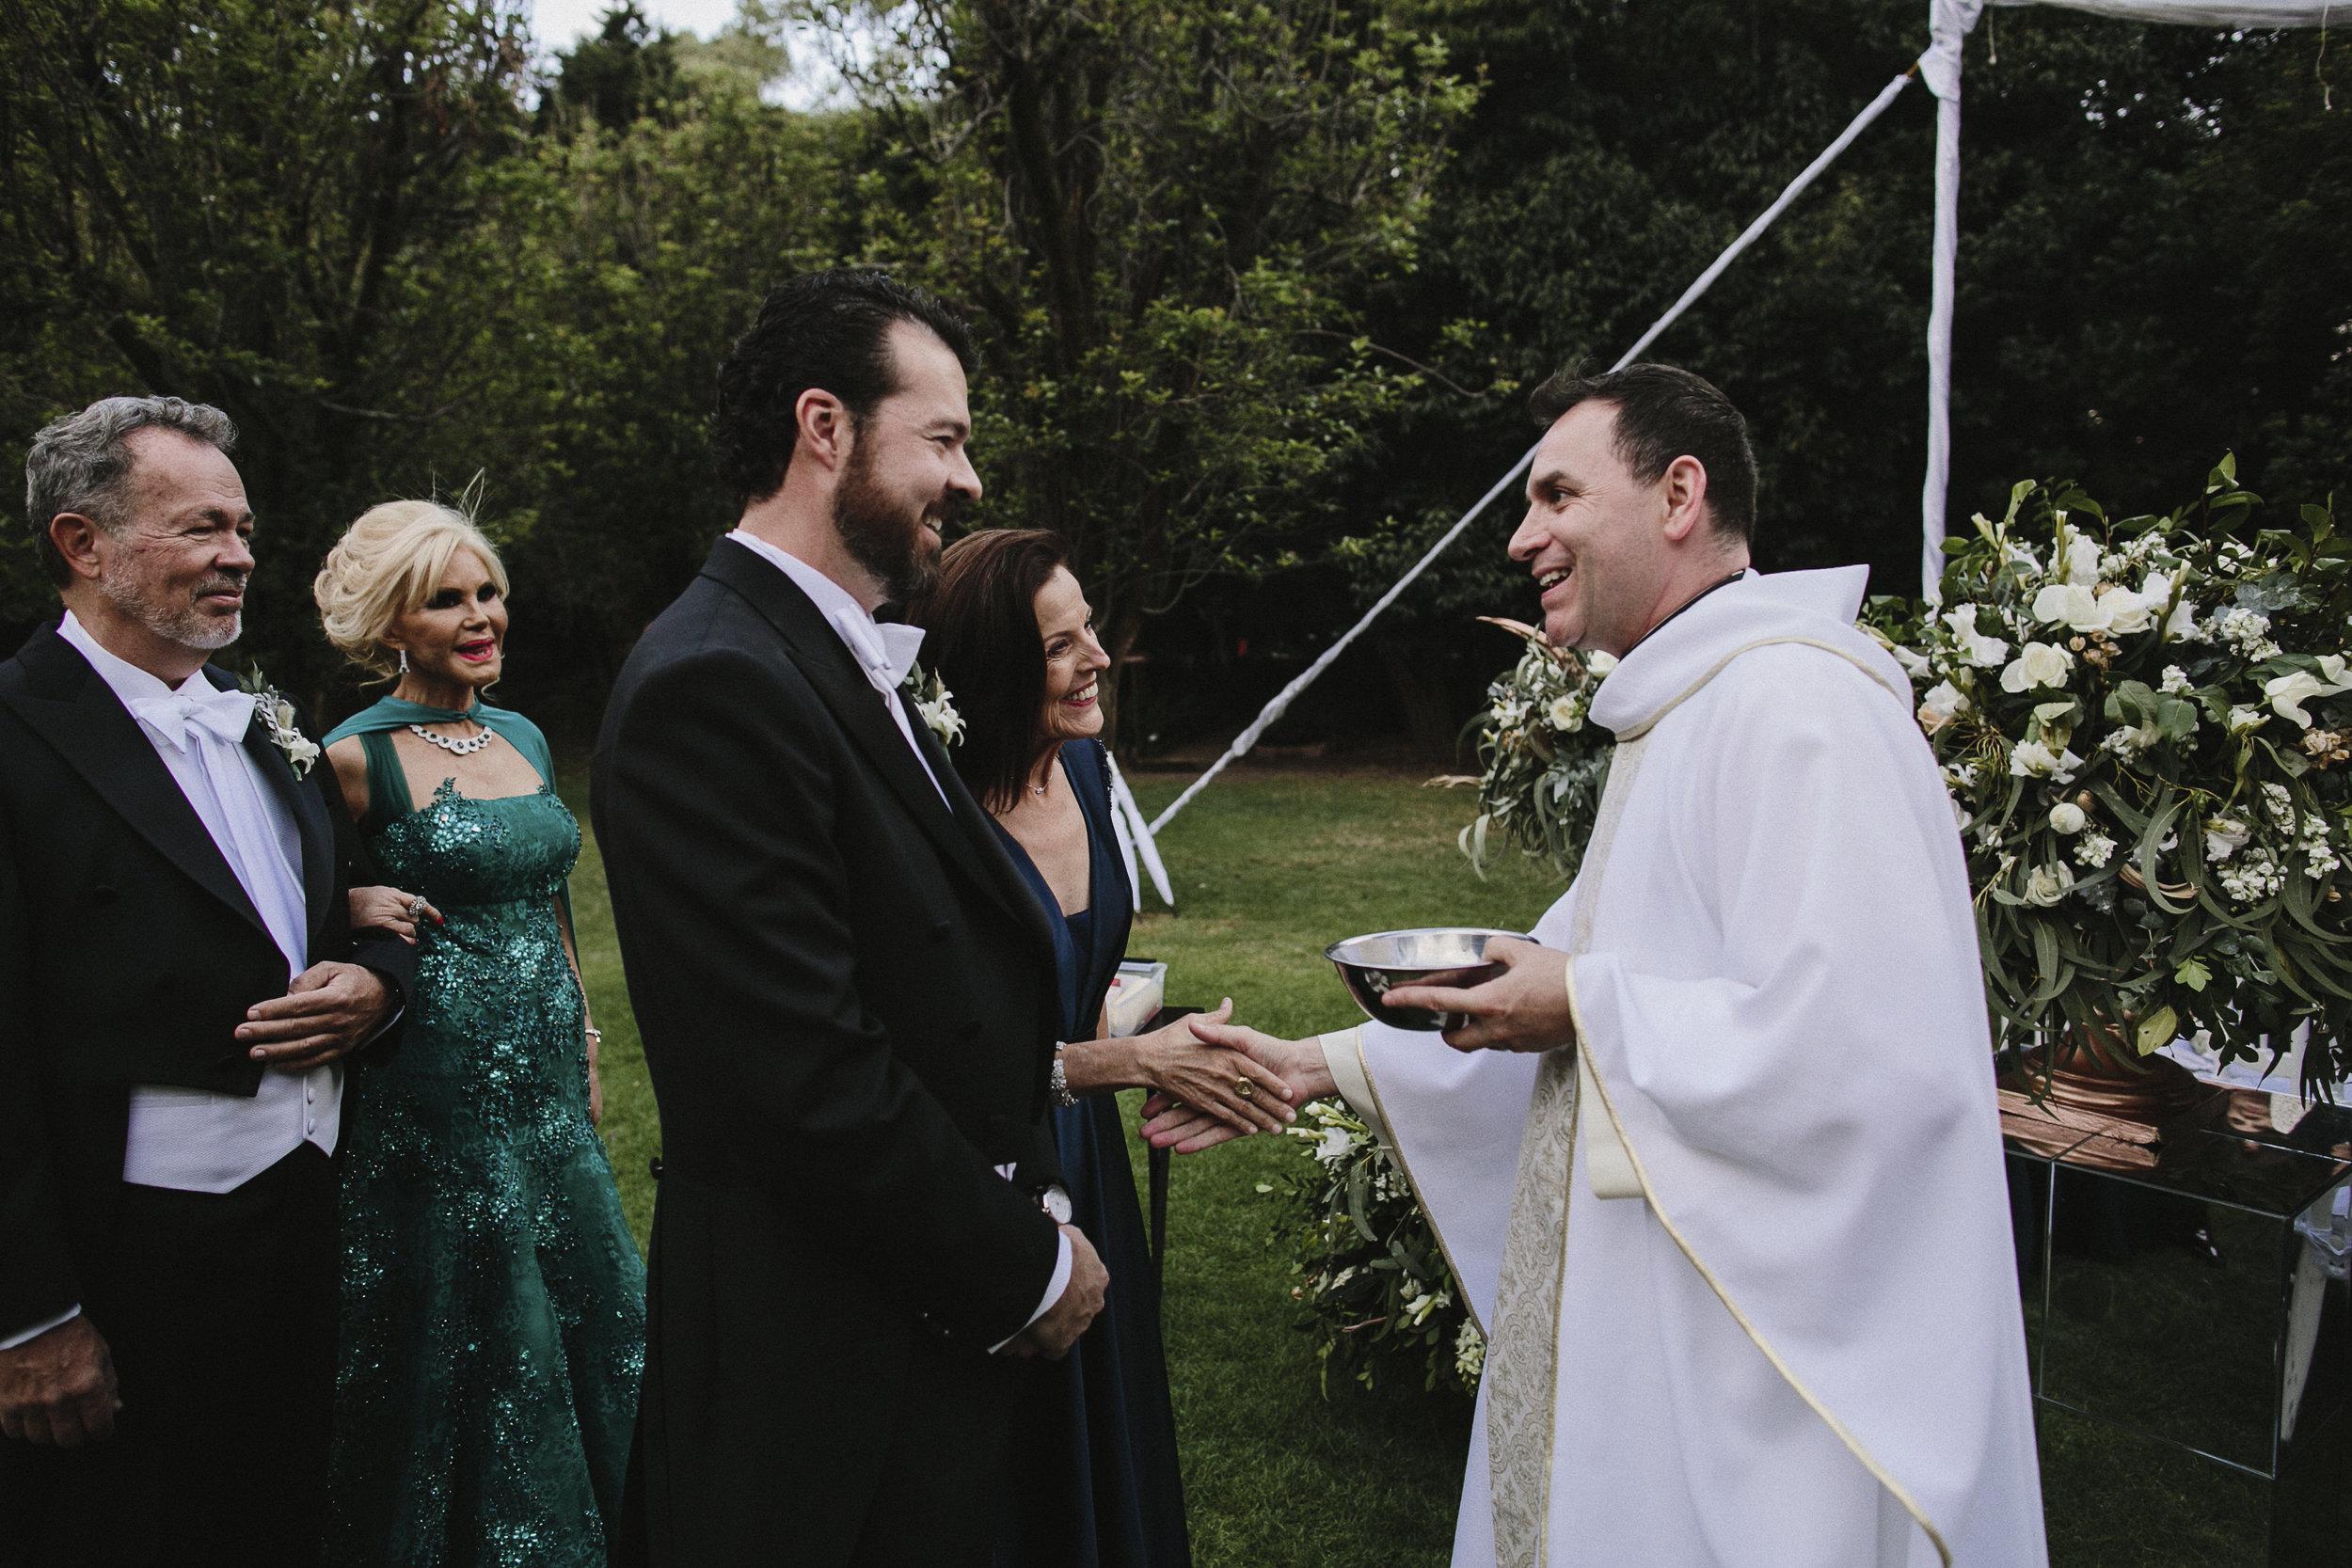 alfonso_flores_destination_wedding_photogrpahy_paola_alonso-362.JPG